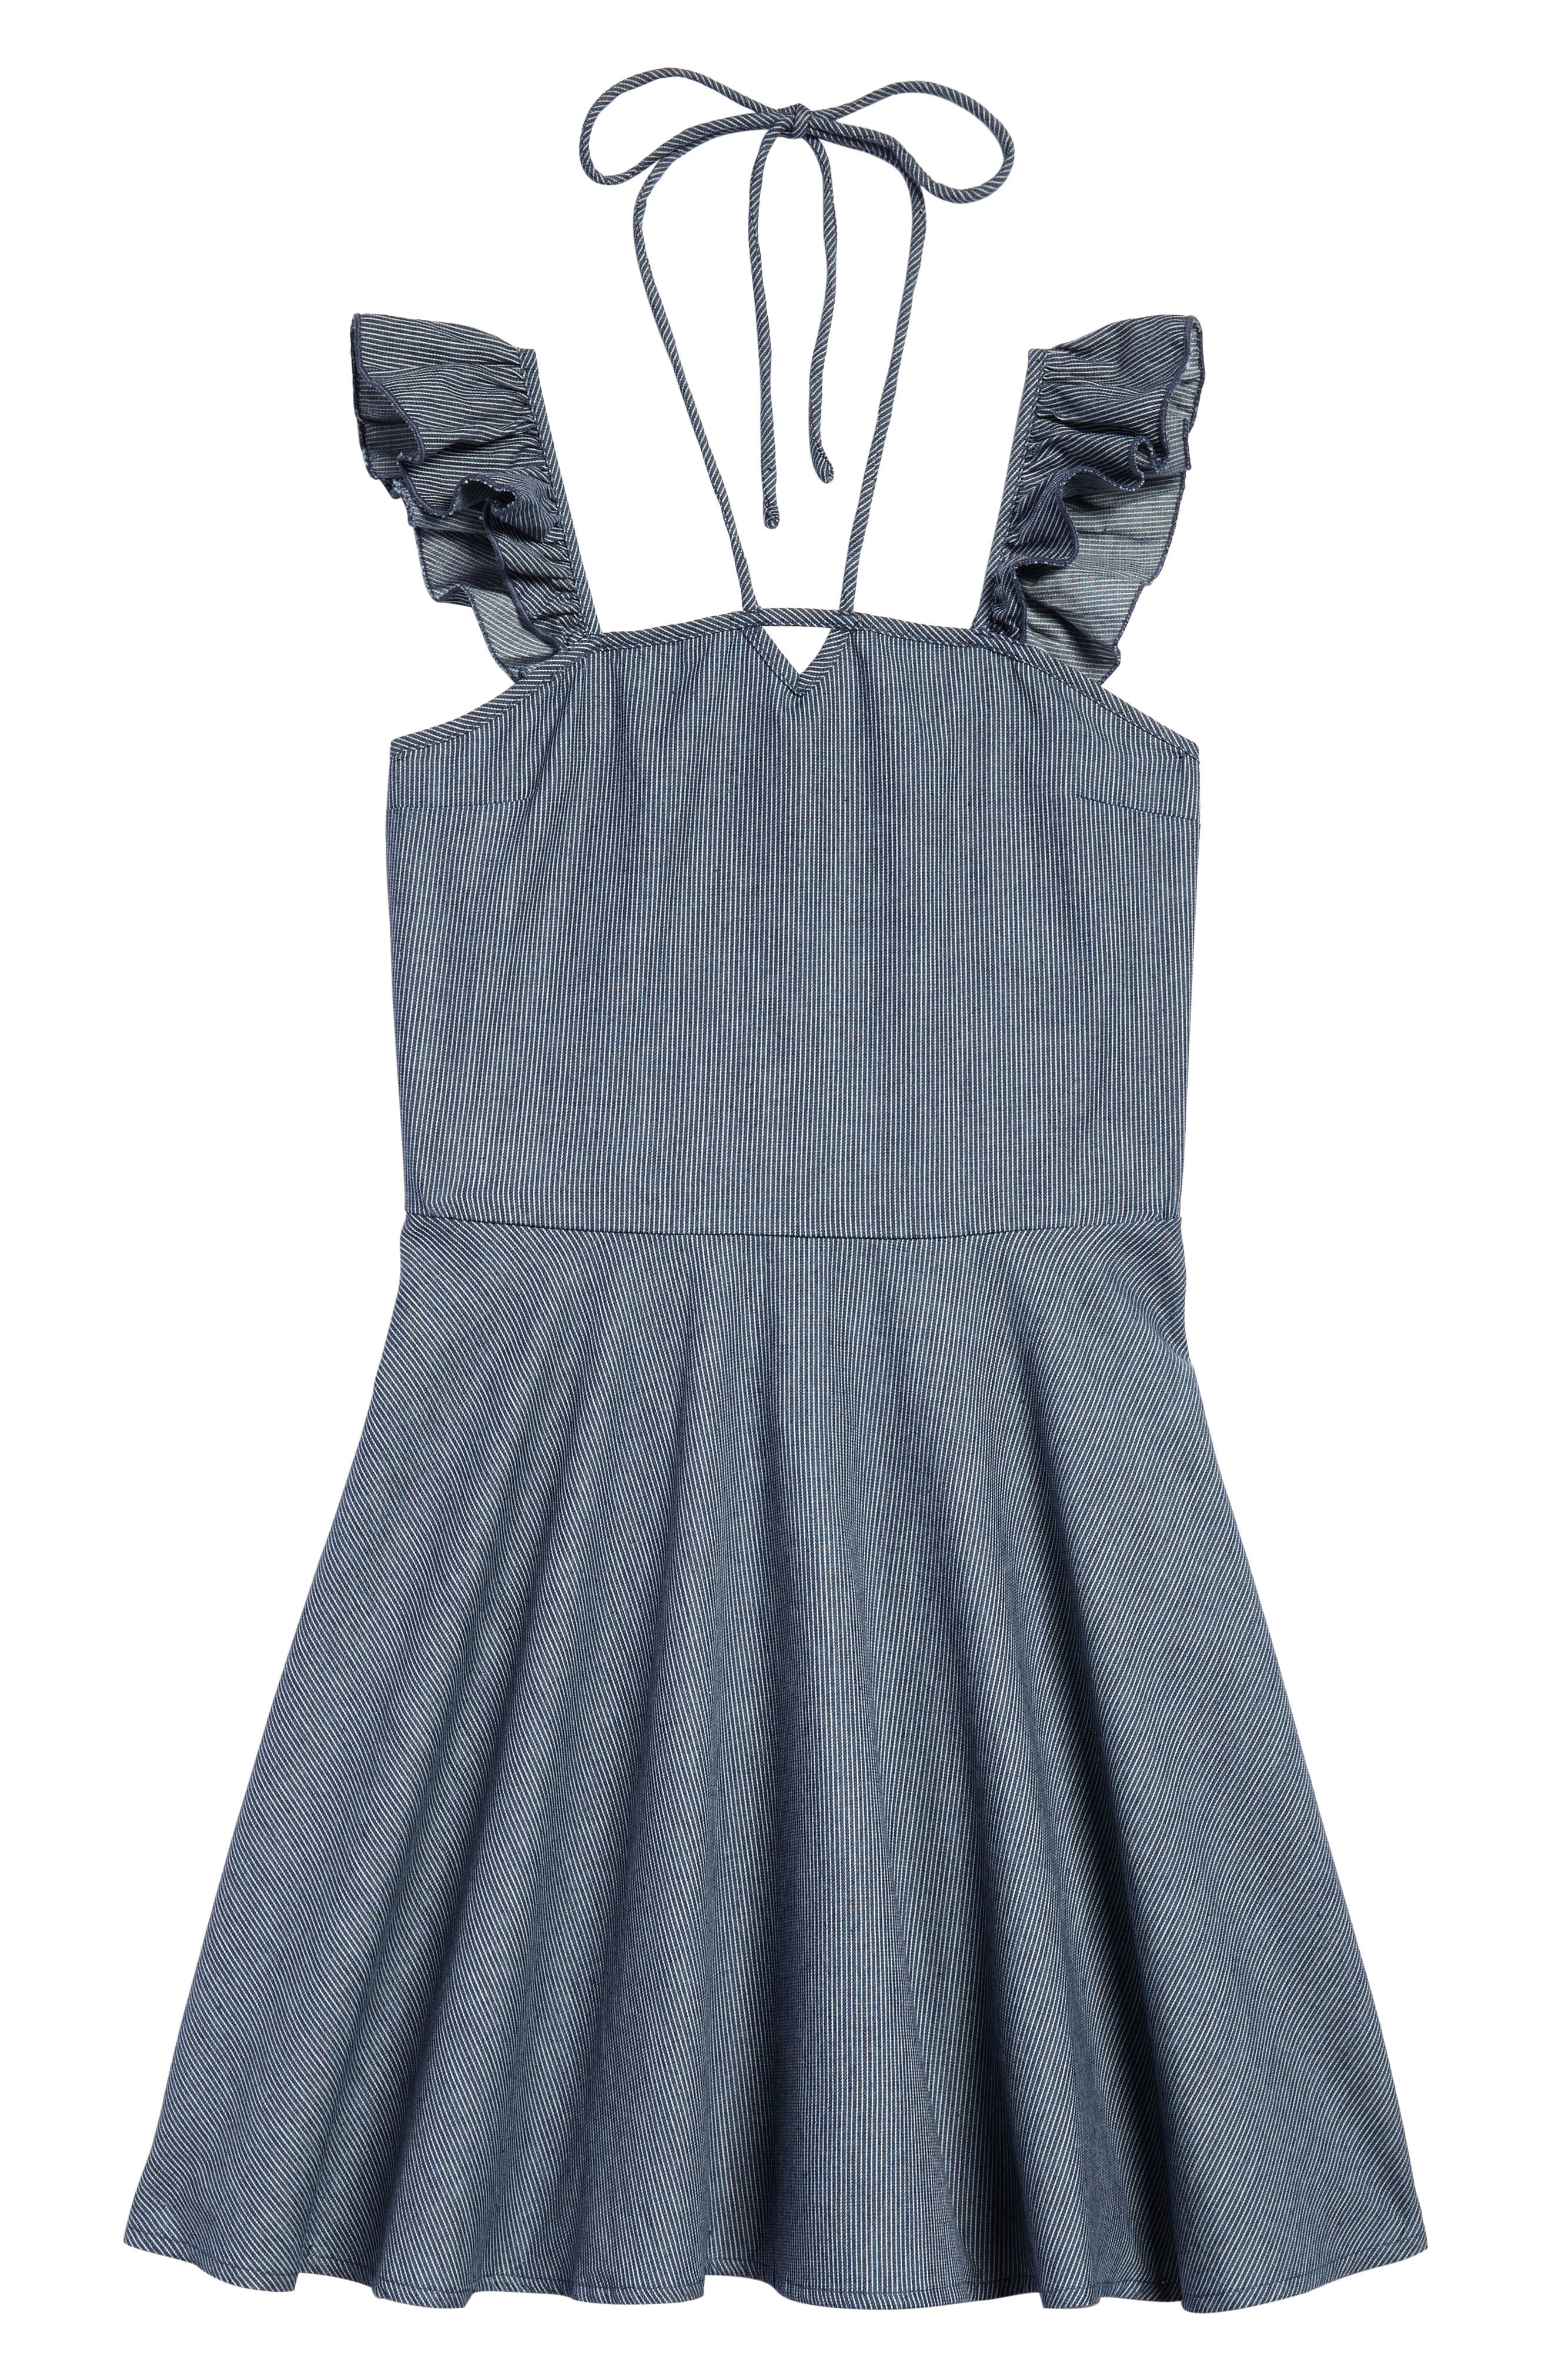 Ruffle Shoulder Dress,                             Main thumbnail 1, color,                             410